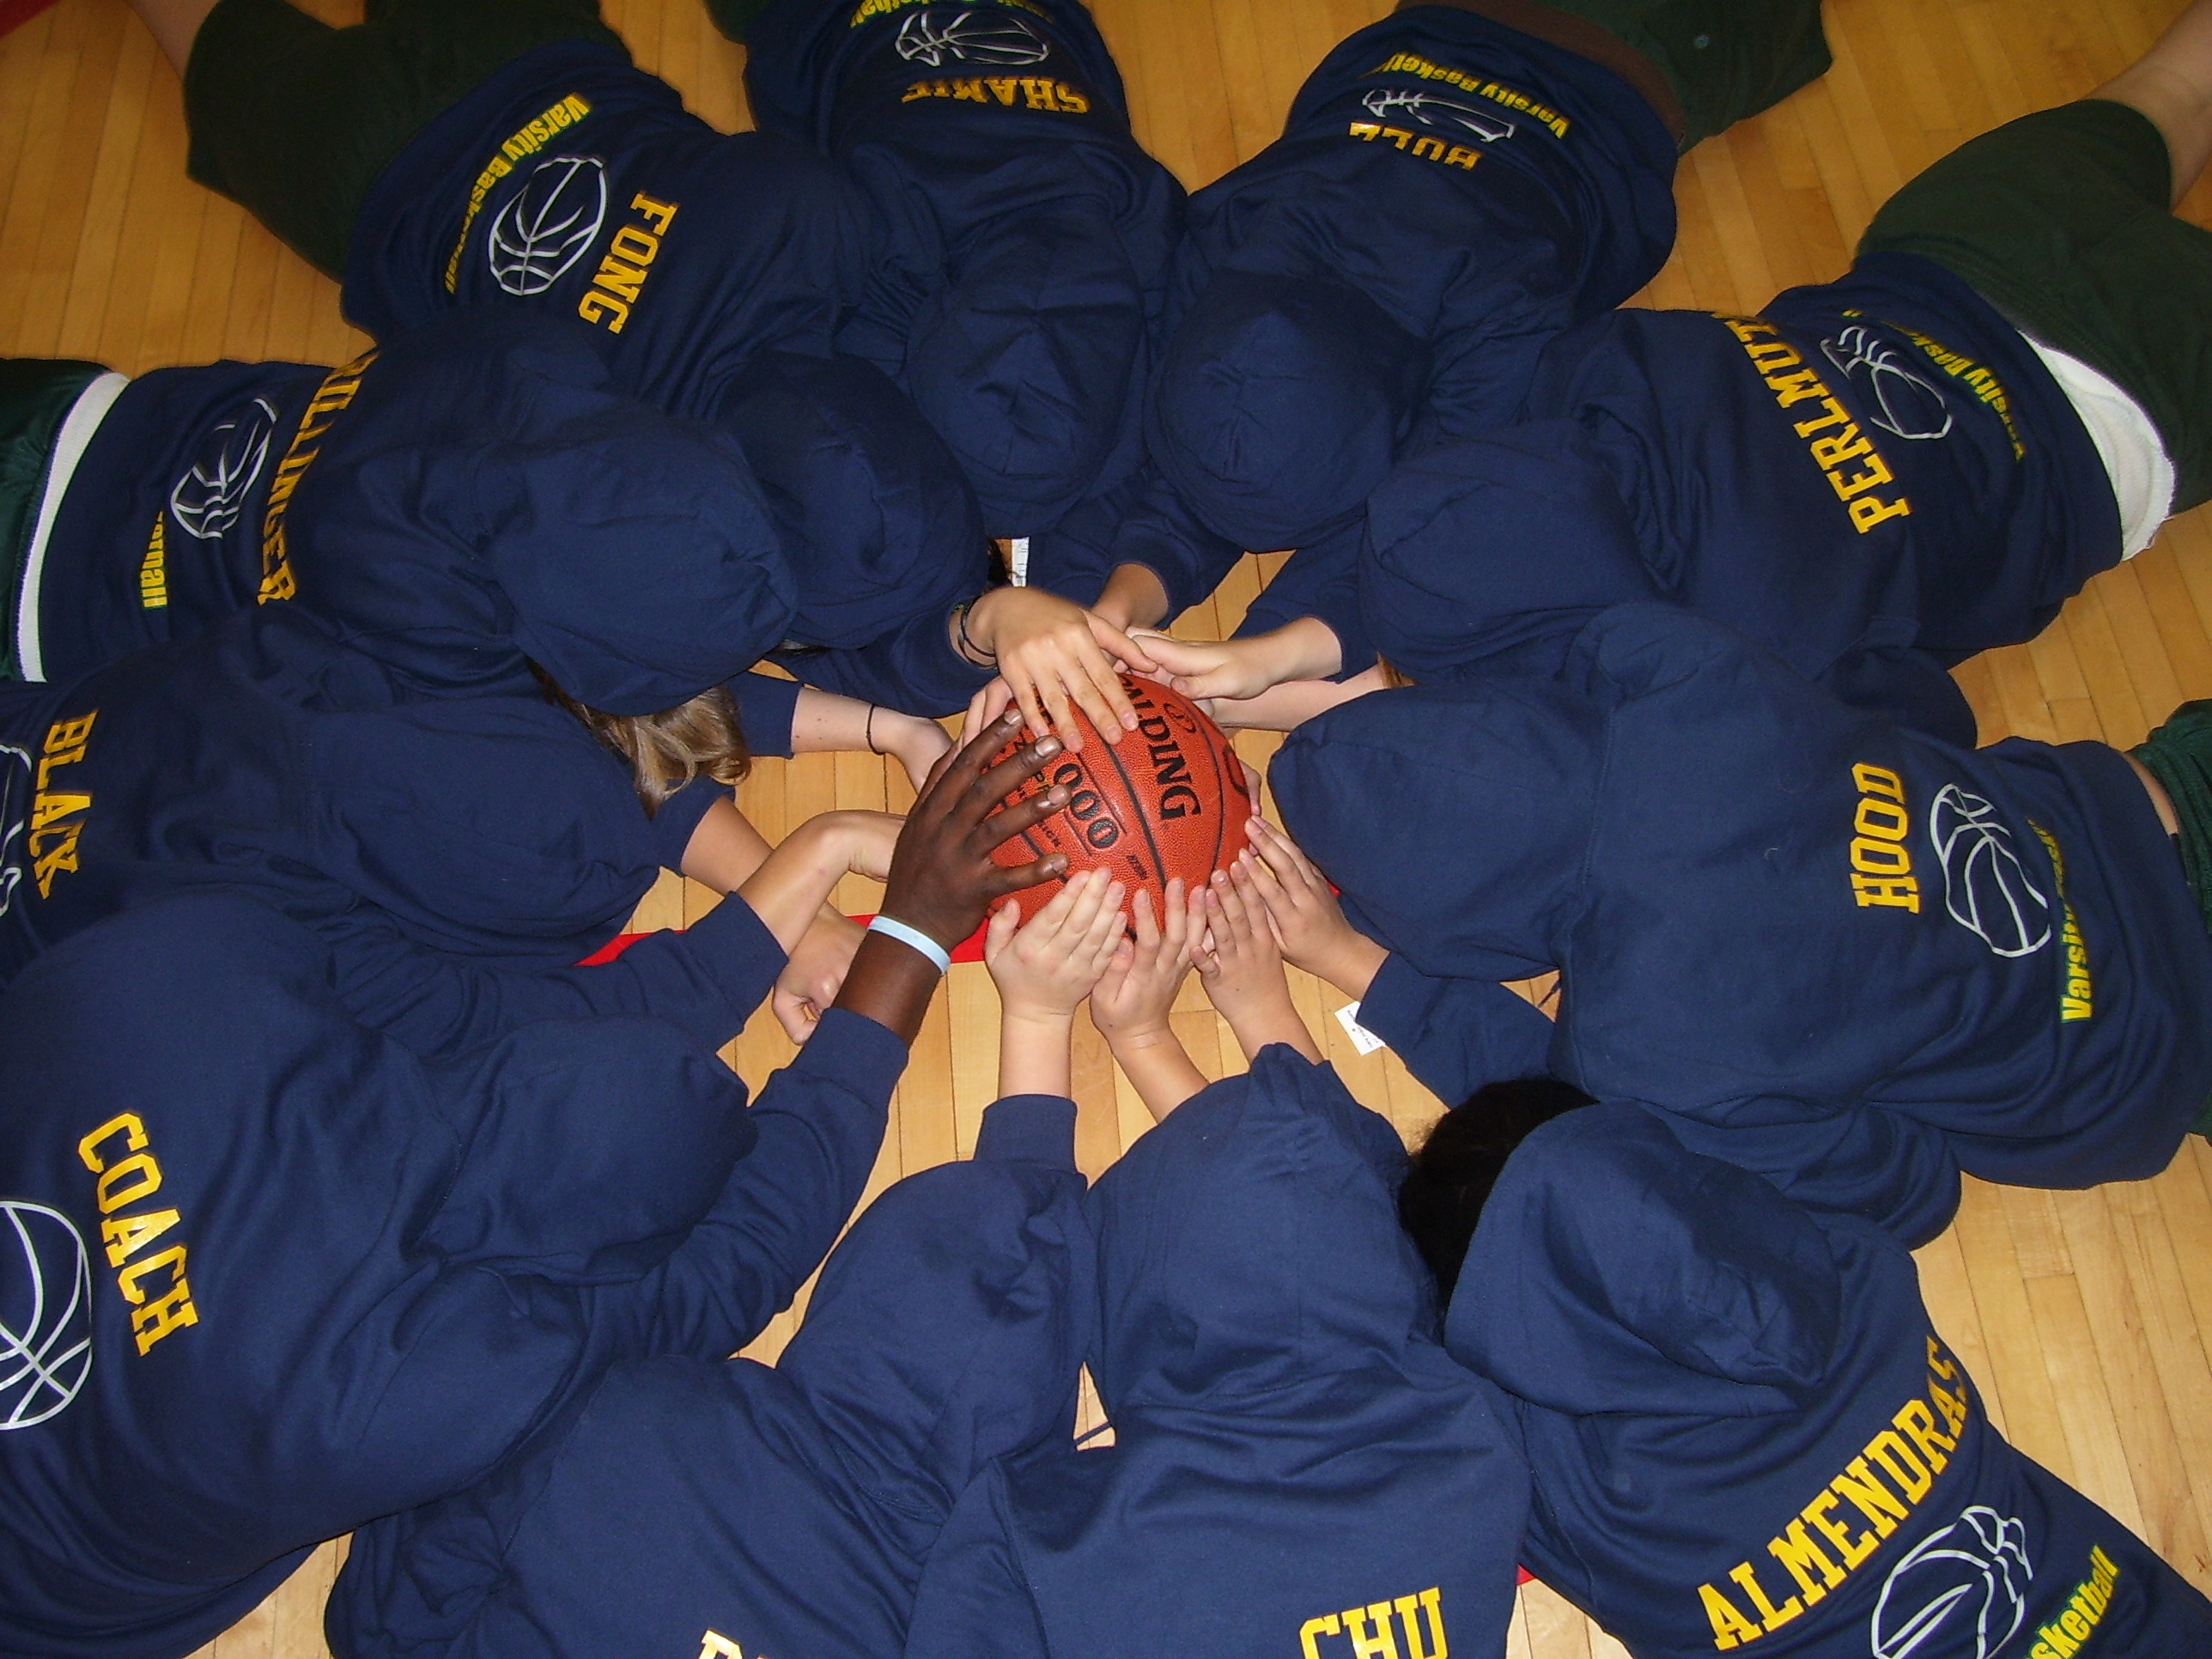 Custom T-Shirts for Varsity Basketball All Dressed Up - Shirt ...